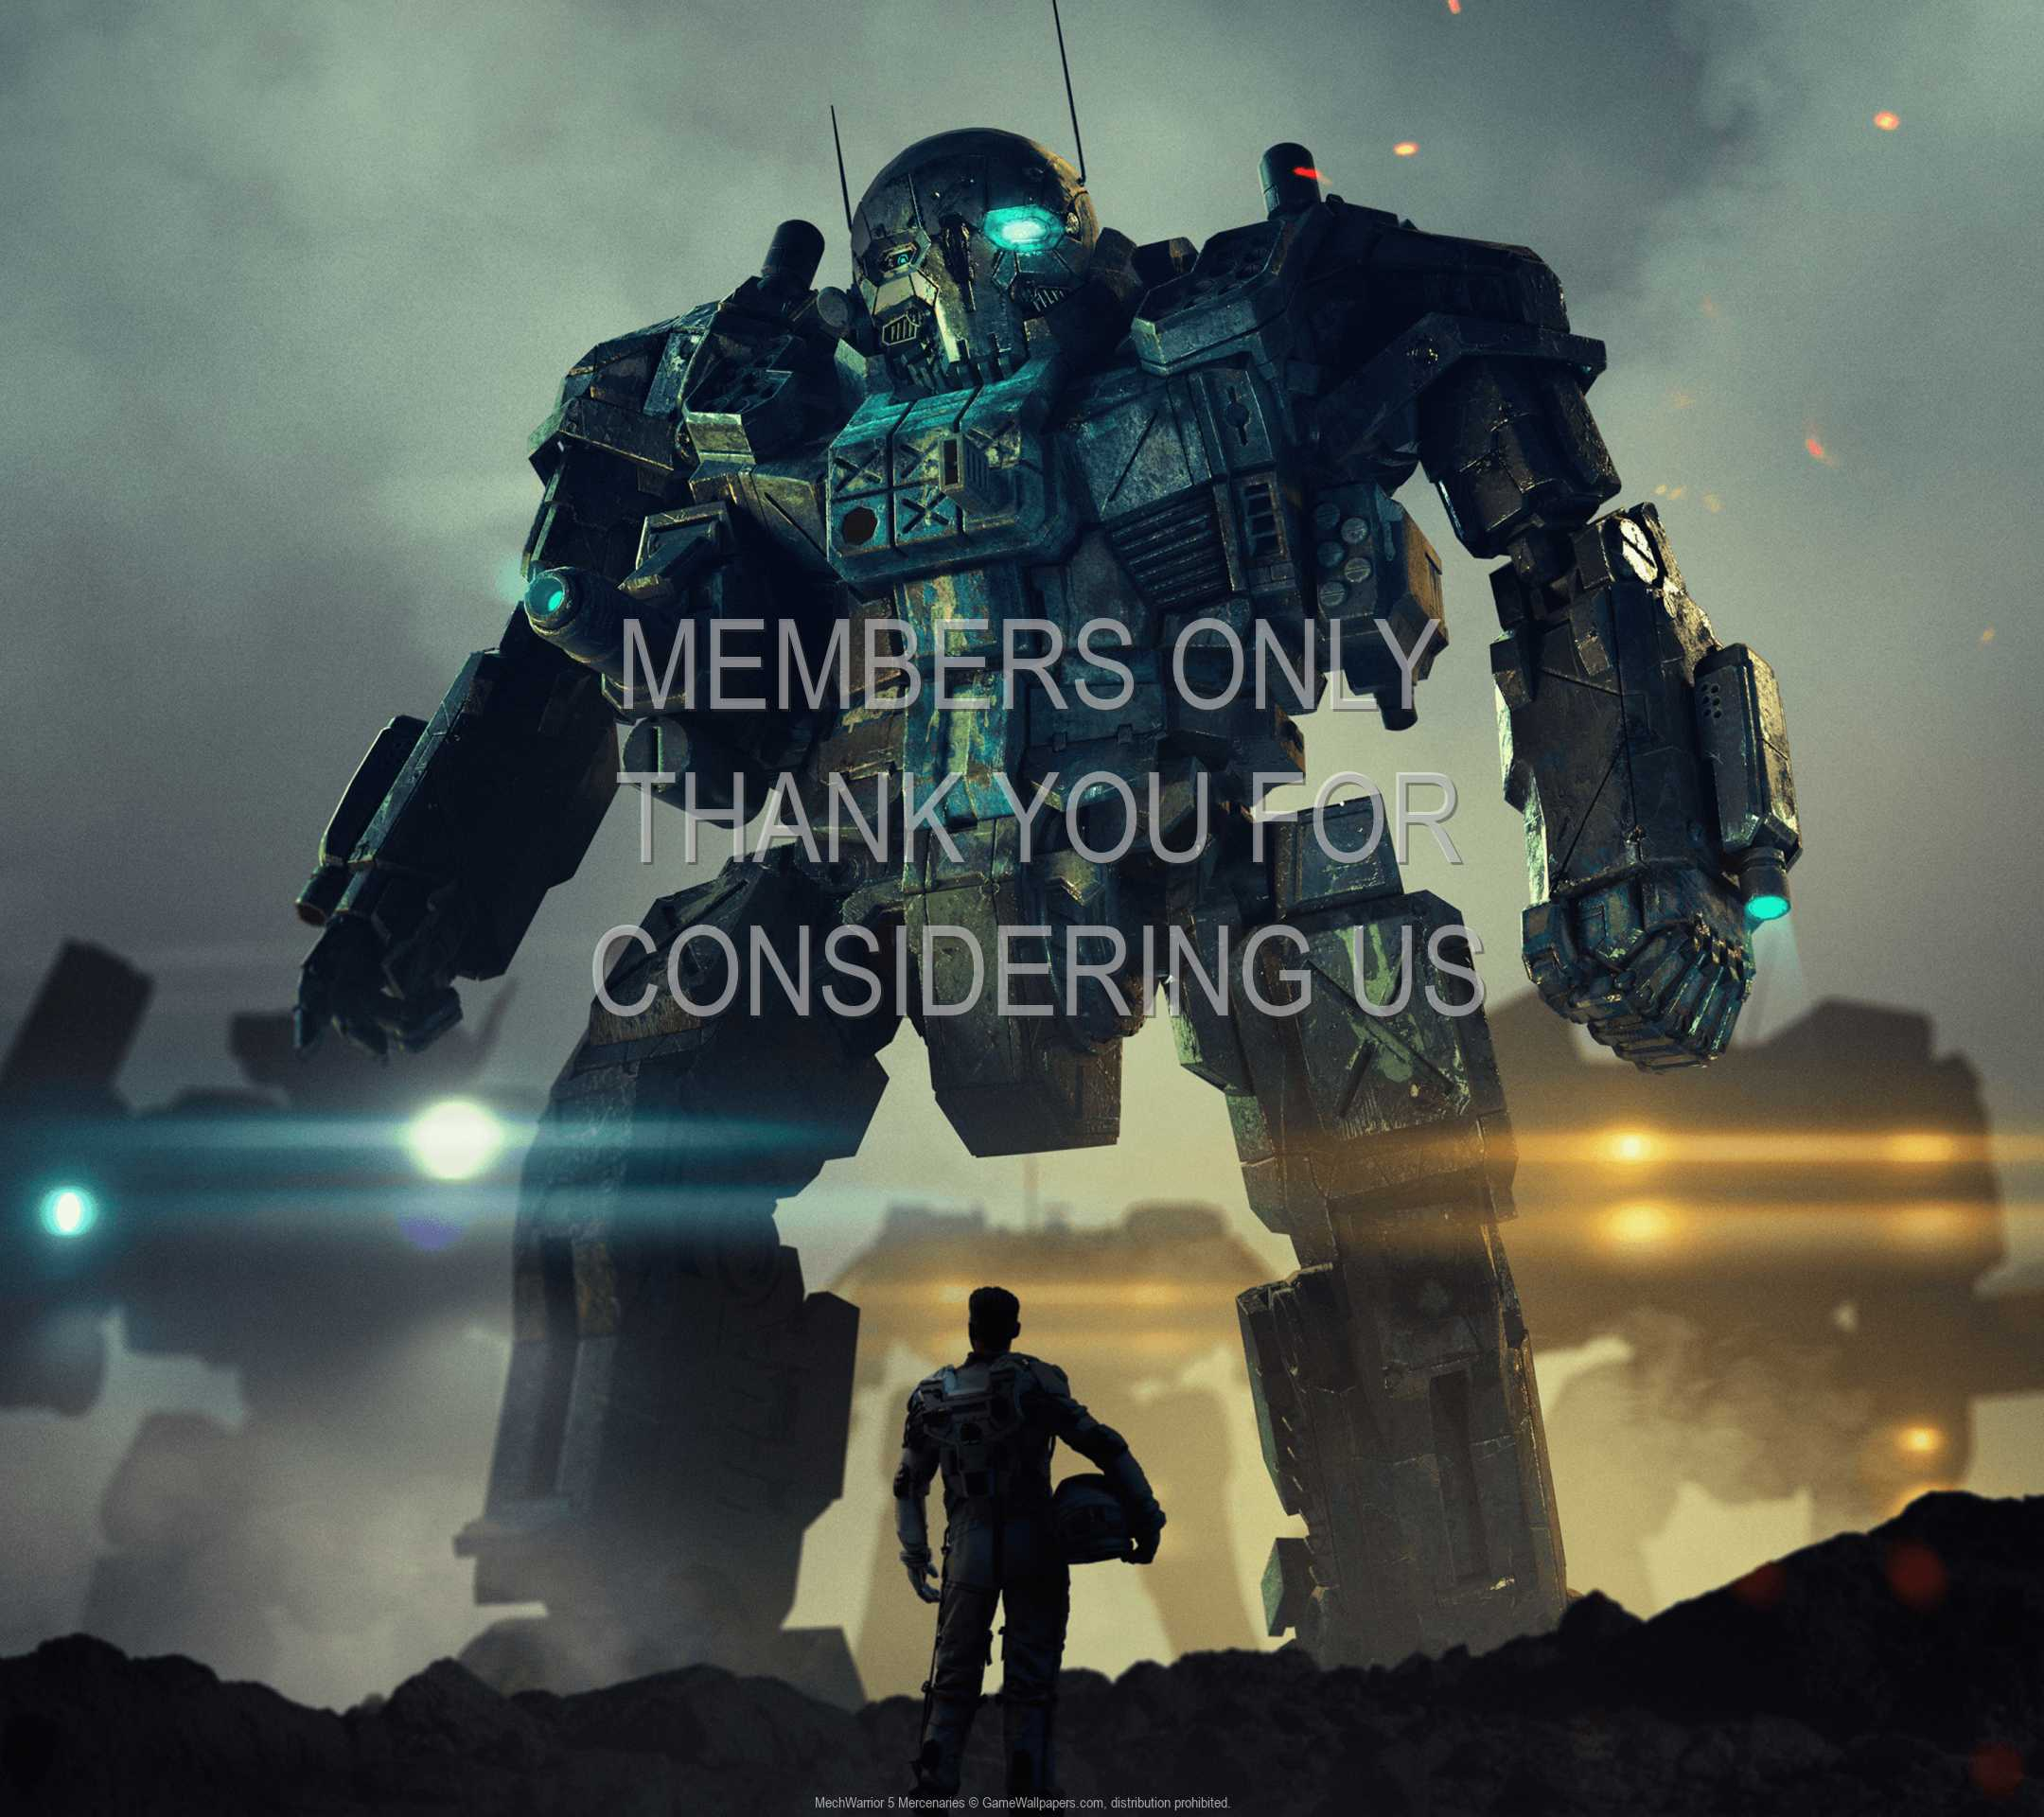 MechWarrior 5: Mercenaries 1080p Horizontal Mobile wallpaper or background 01